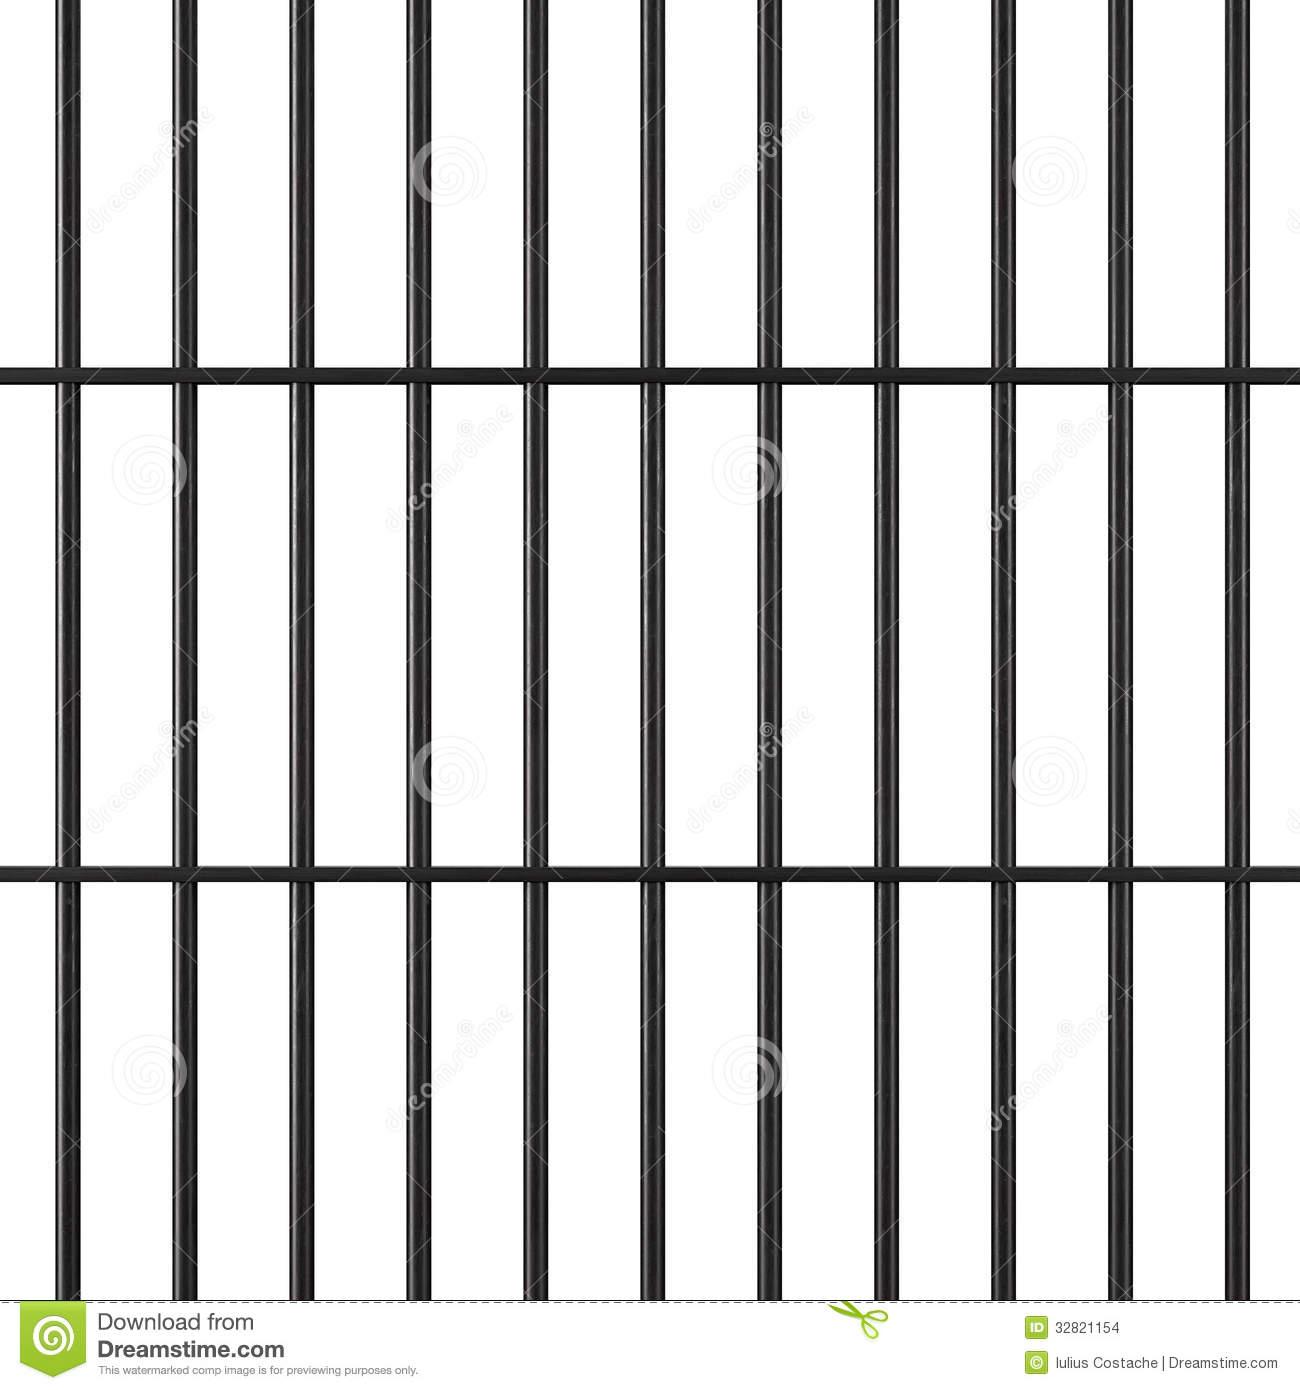 Clipart Jail Bars-clipart jail bars-4